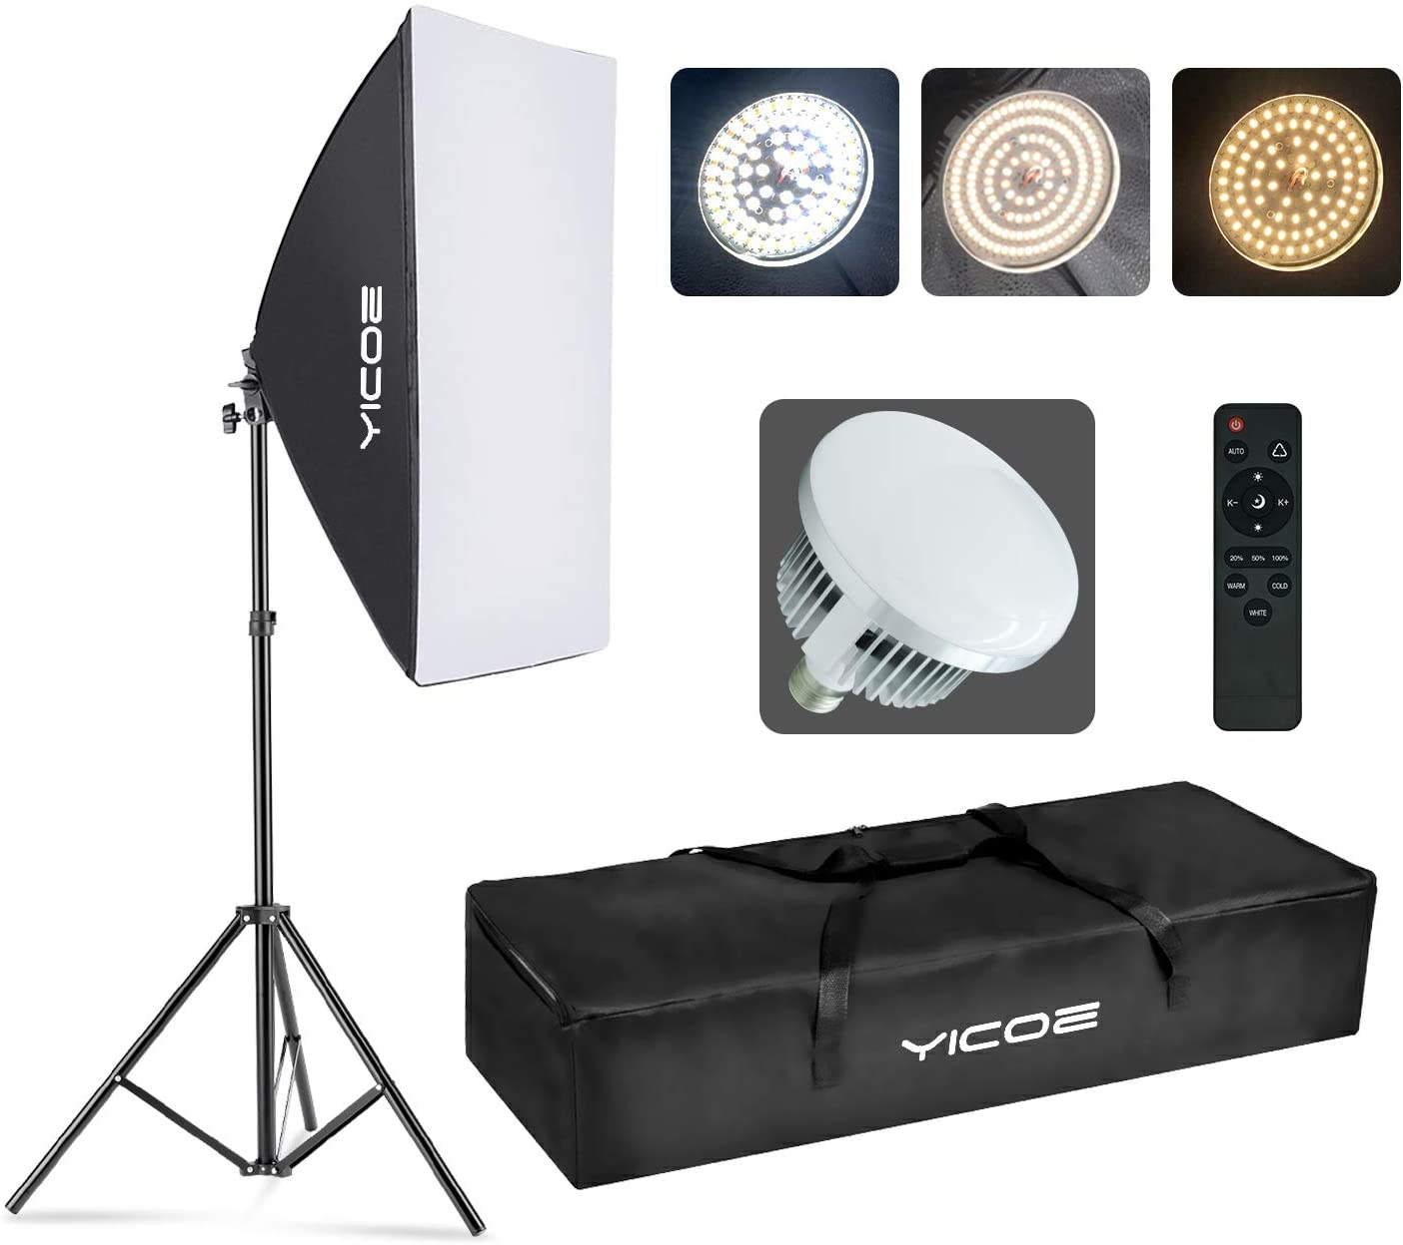 Amazon Com Yicoe Softbox Photography Lighting Kit Professional Photo Studio Equipment 20 X28 Studio Photography Light With 5700k Energy Saving Light Bulb For Filming Youtube Video Model Advertising Shooting Camera Photo